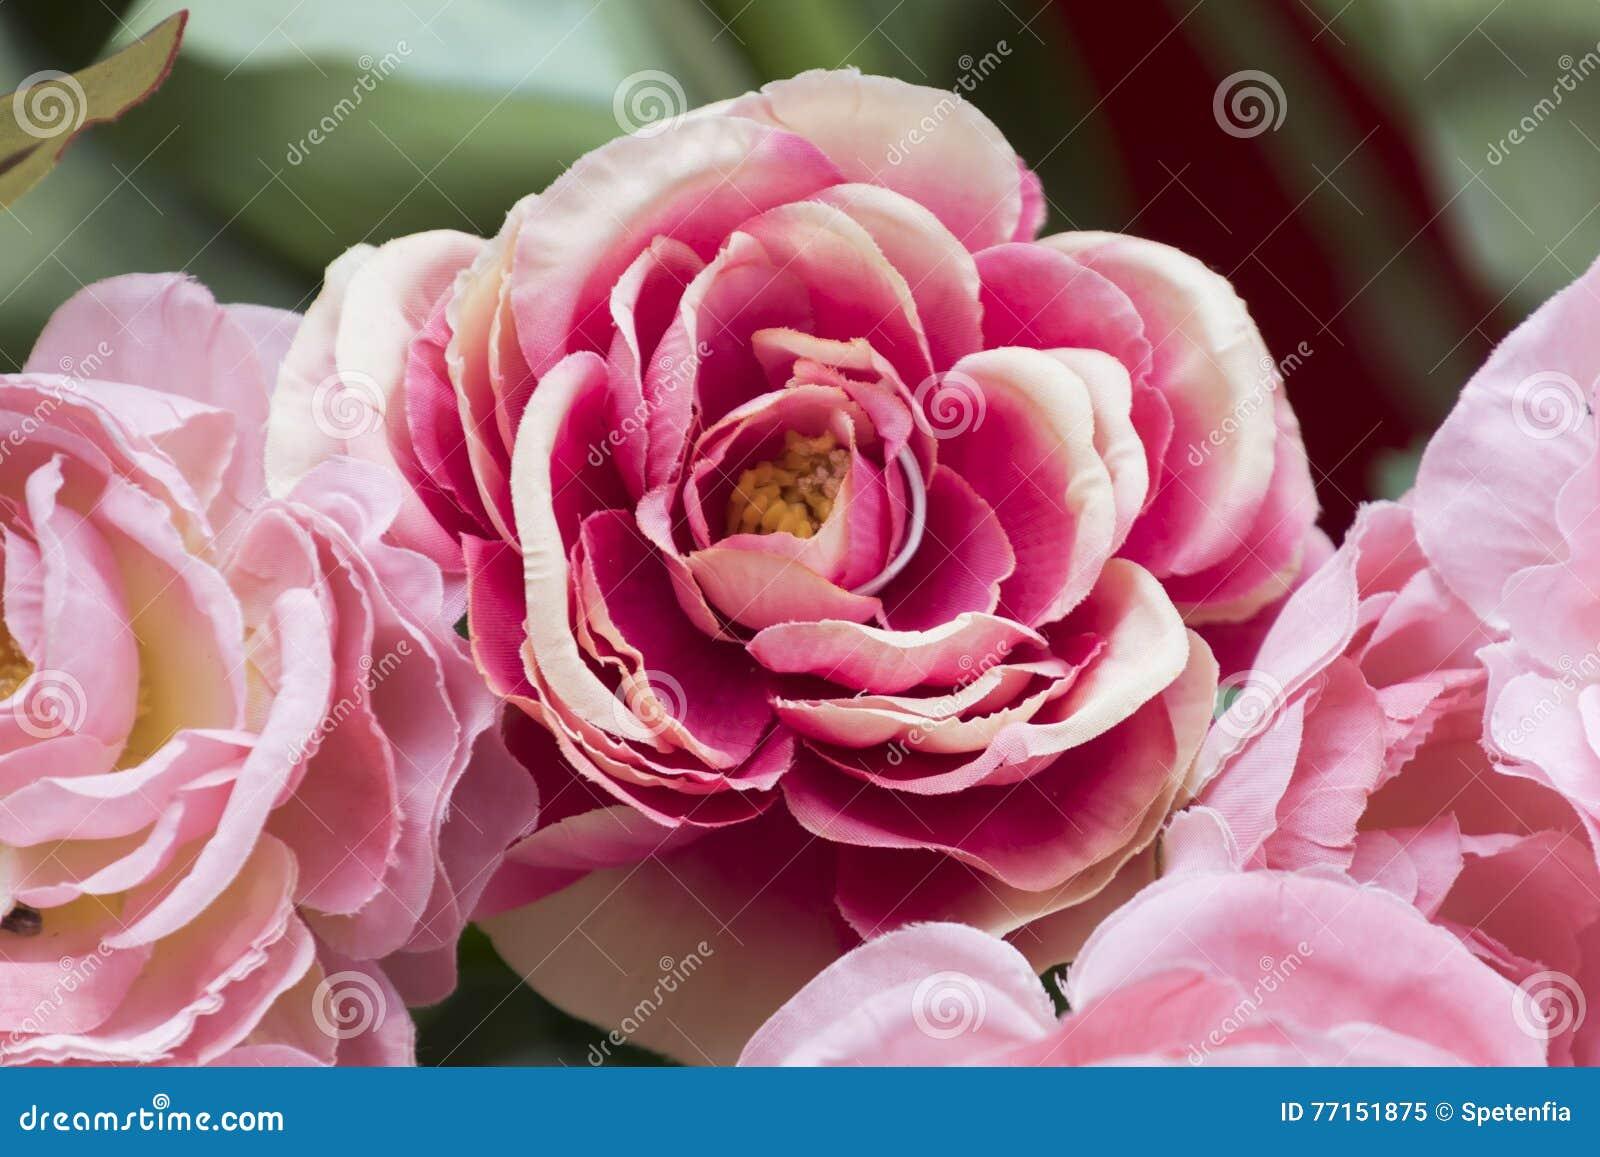 Roses de tissu de métier